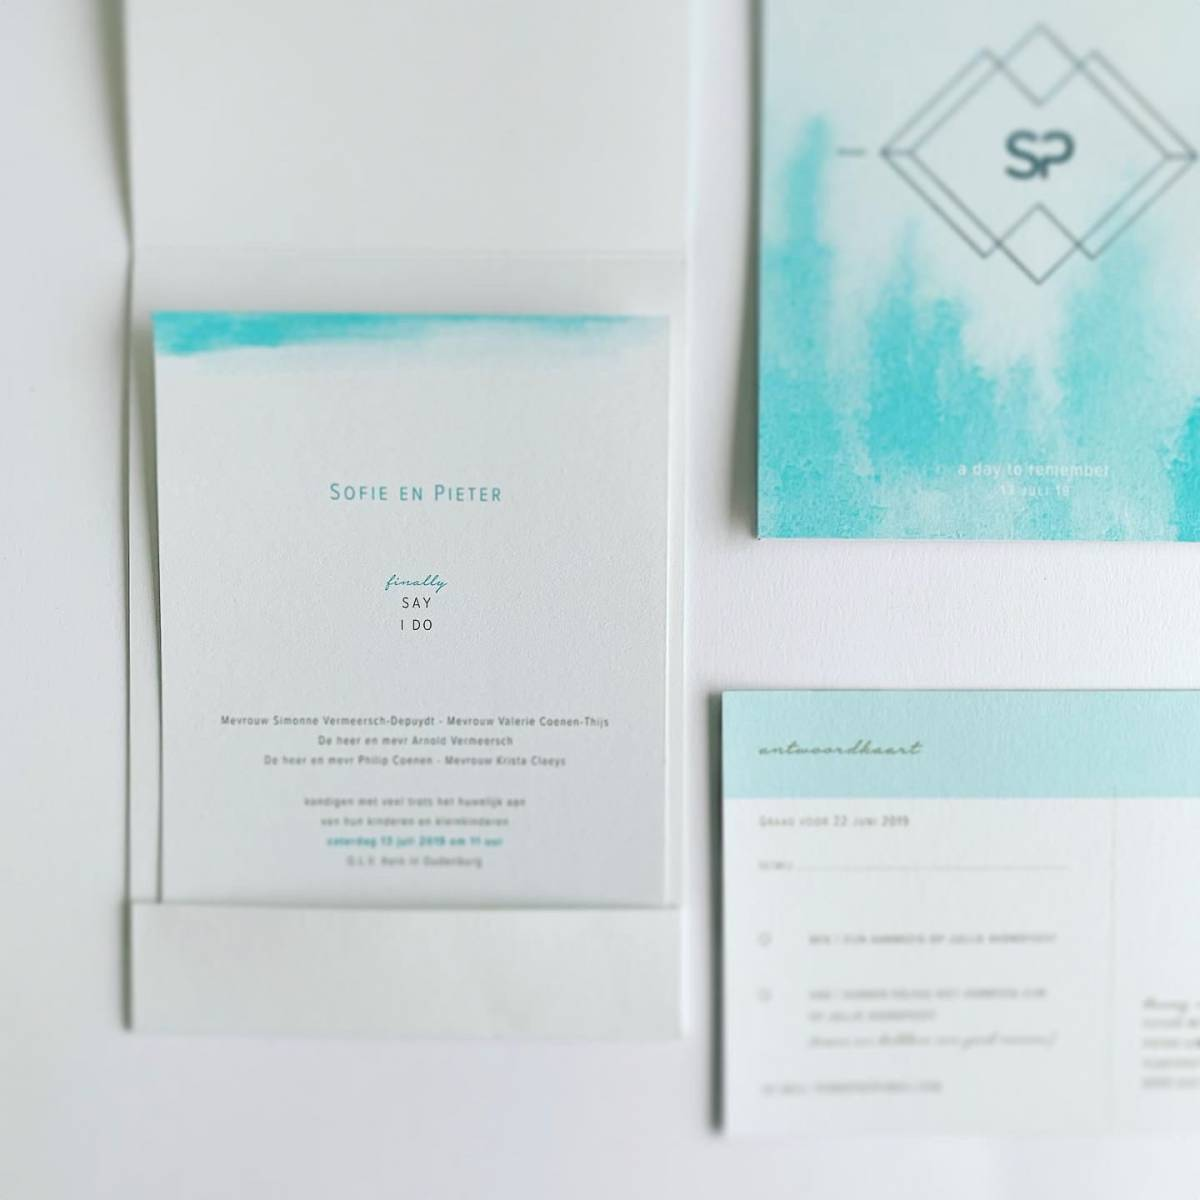 Scarabar - Trouwuitnodiging - Huwelijksuitnodiging - Drukwerk - Huwelijk - Trouw - Bruiloft - House of Weddings - 31